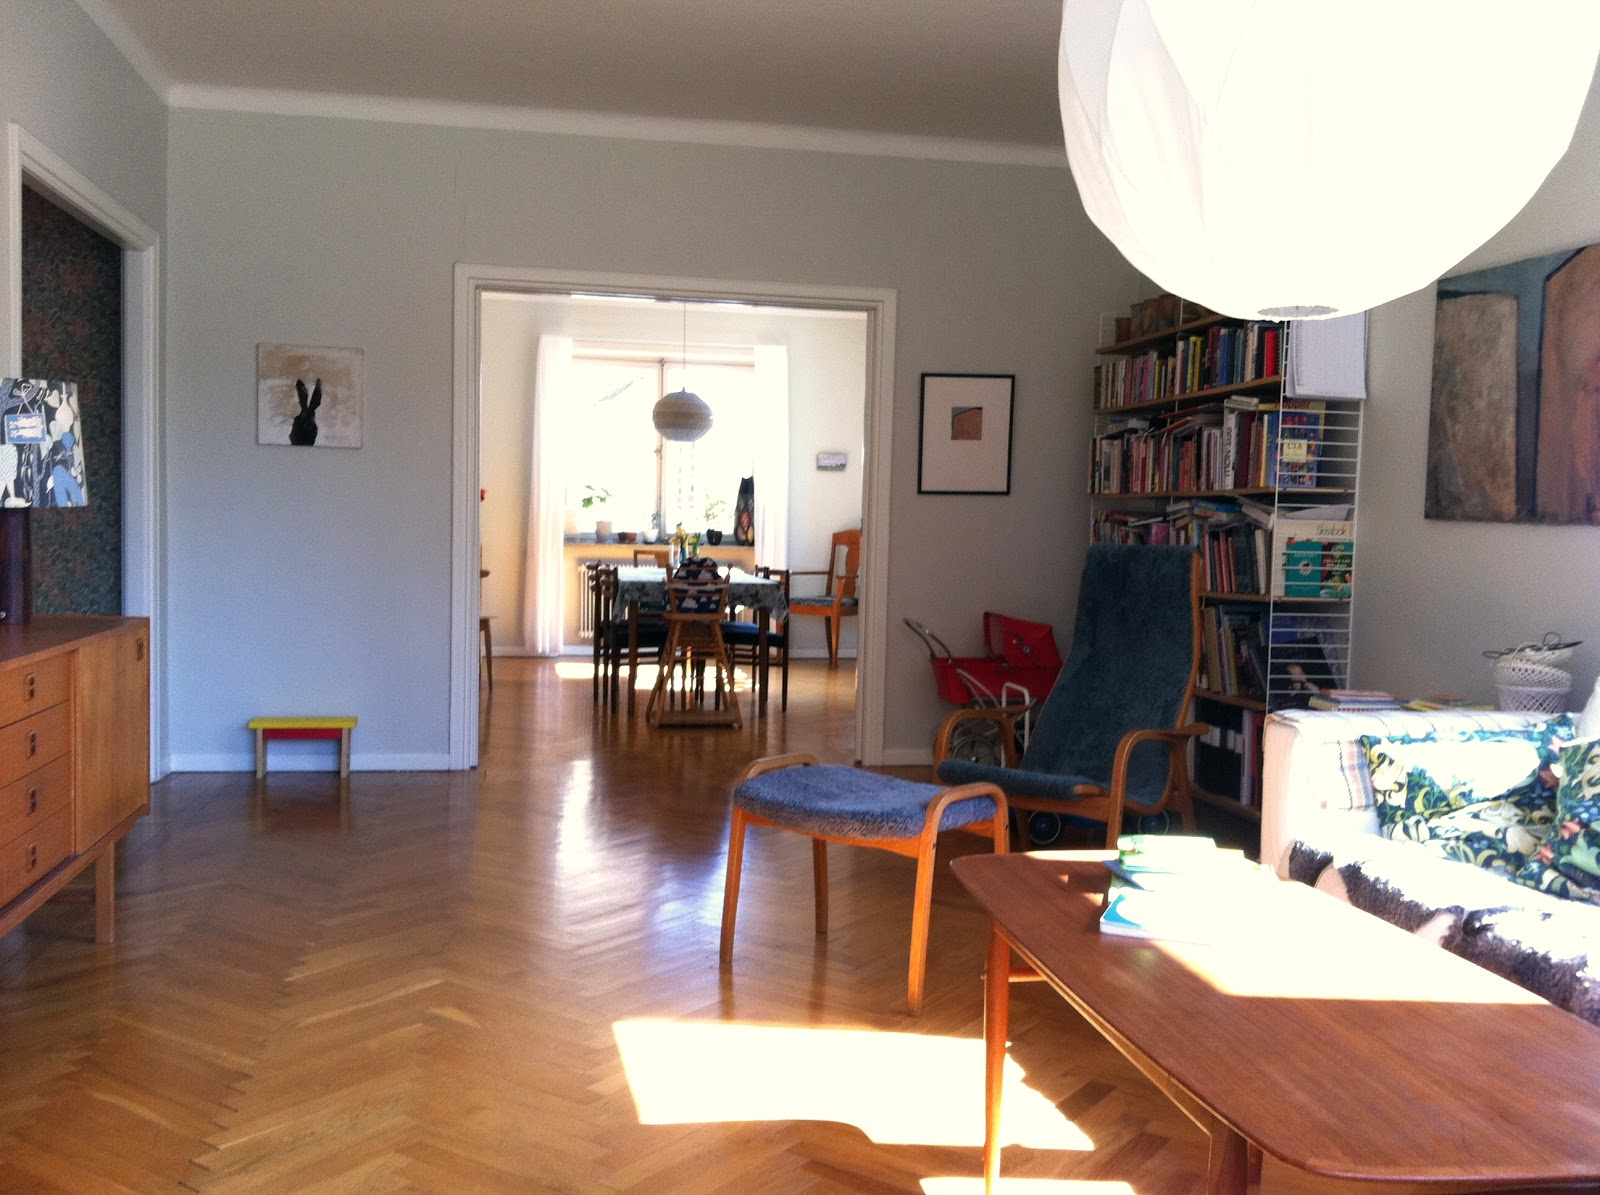 Ulrika Olsson: Vardagsrummet - check!